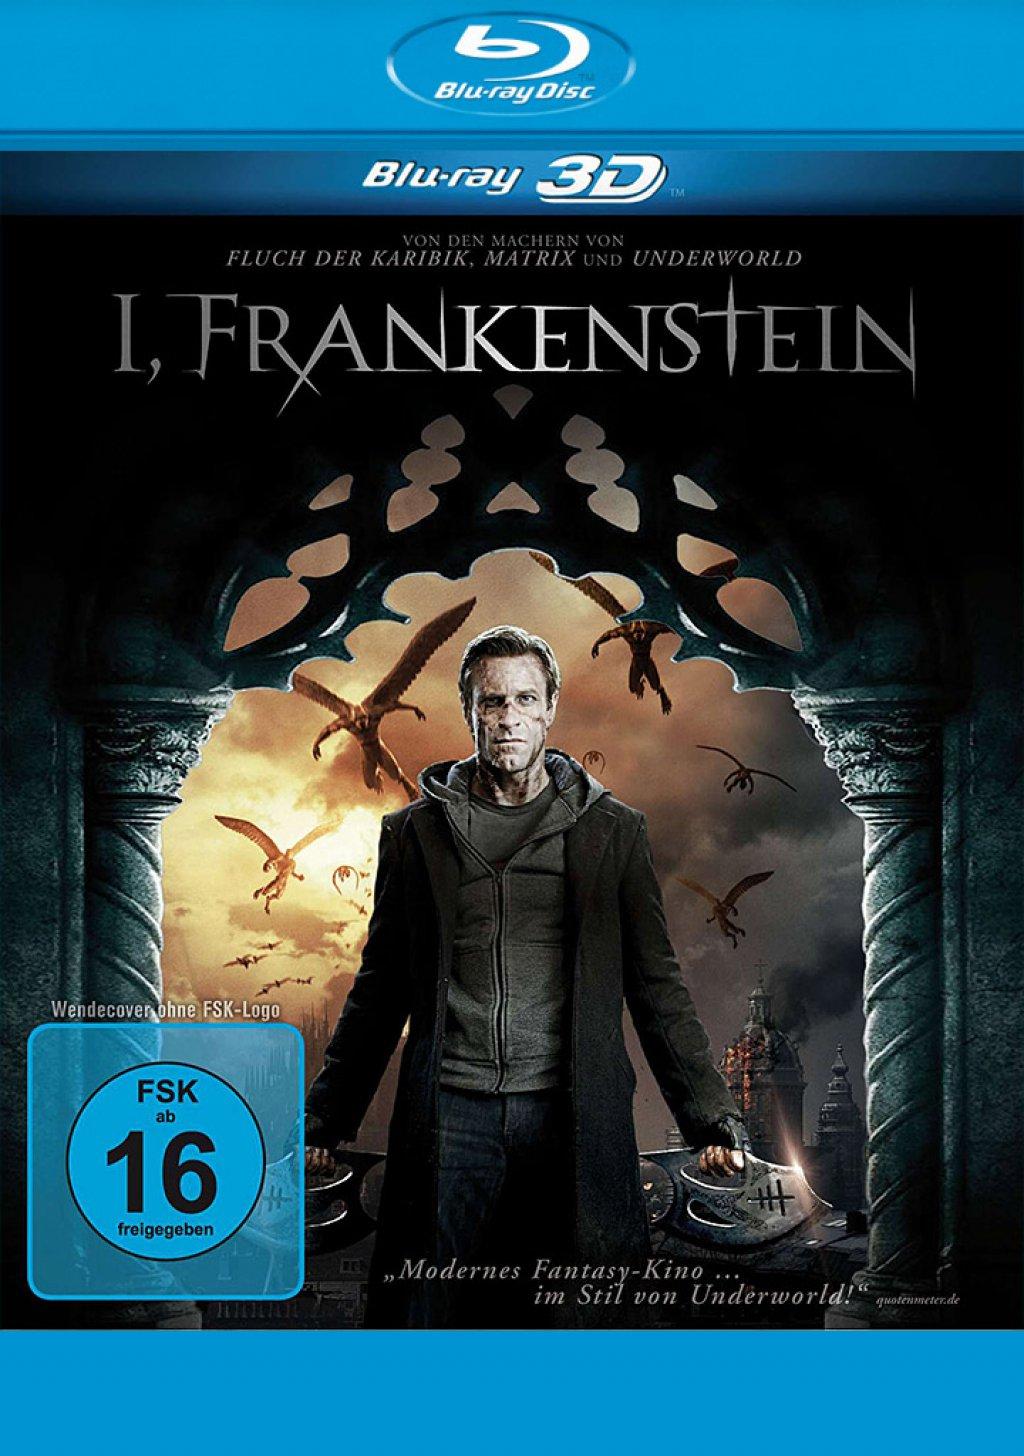 I, Frankenstein - Blu-ray 3D (Blu-ray)